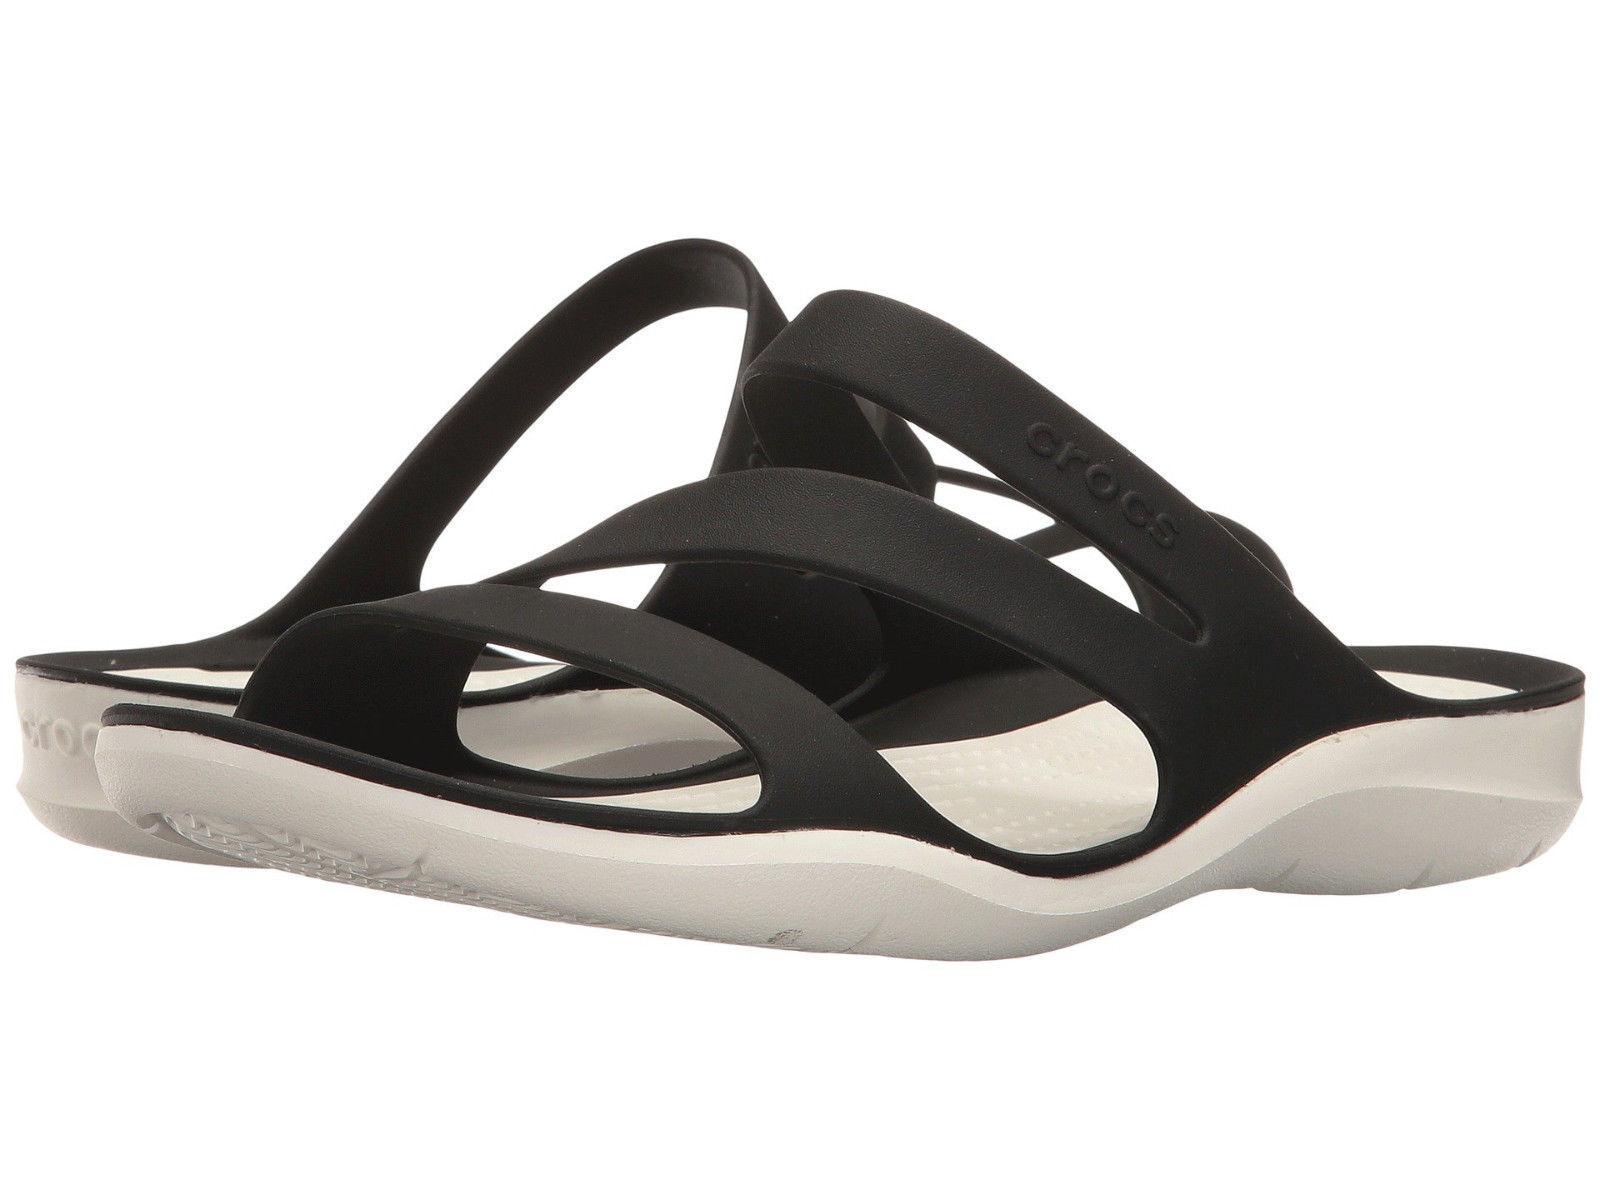 Women Crocs Swiftwater Sandal 203998-066 Black White 100% Authentic Brand New